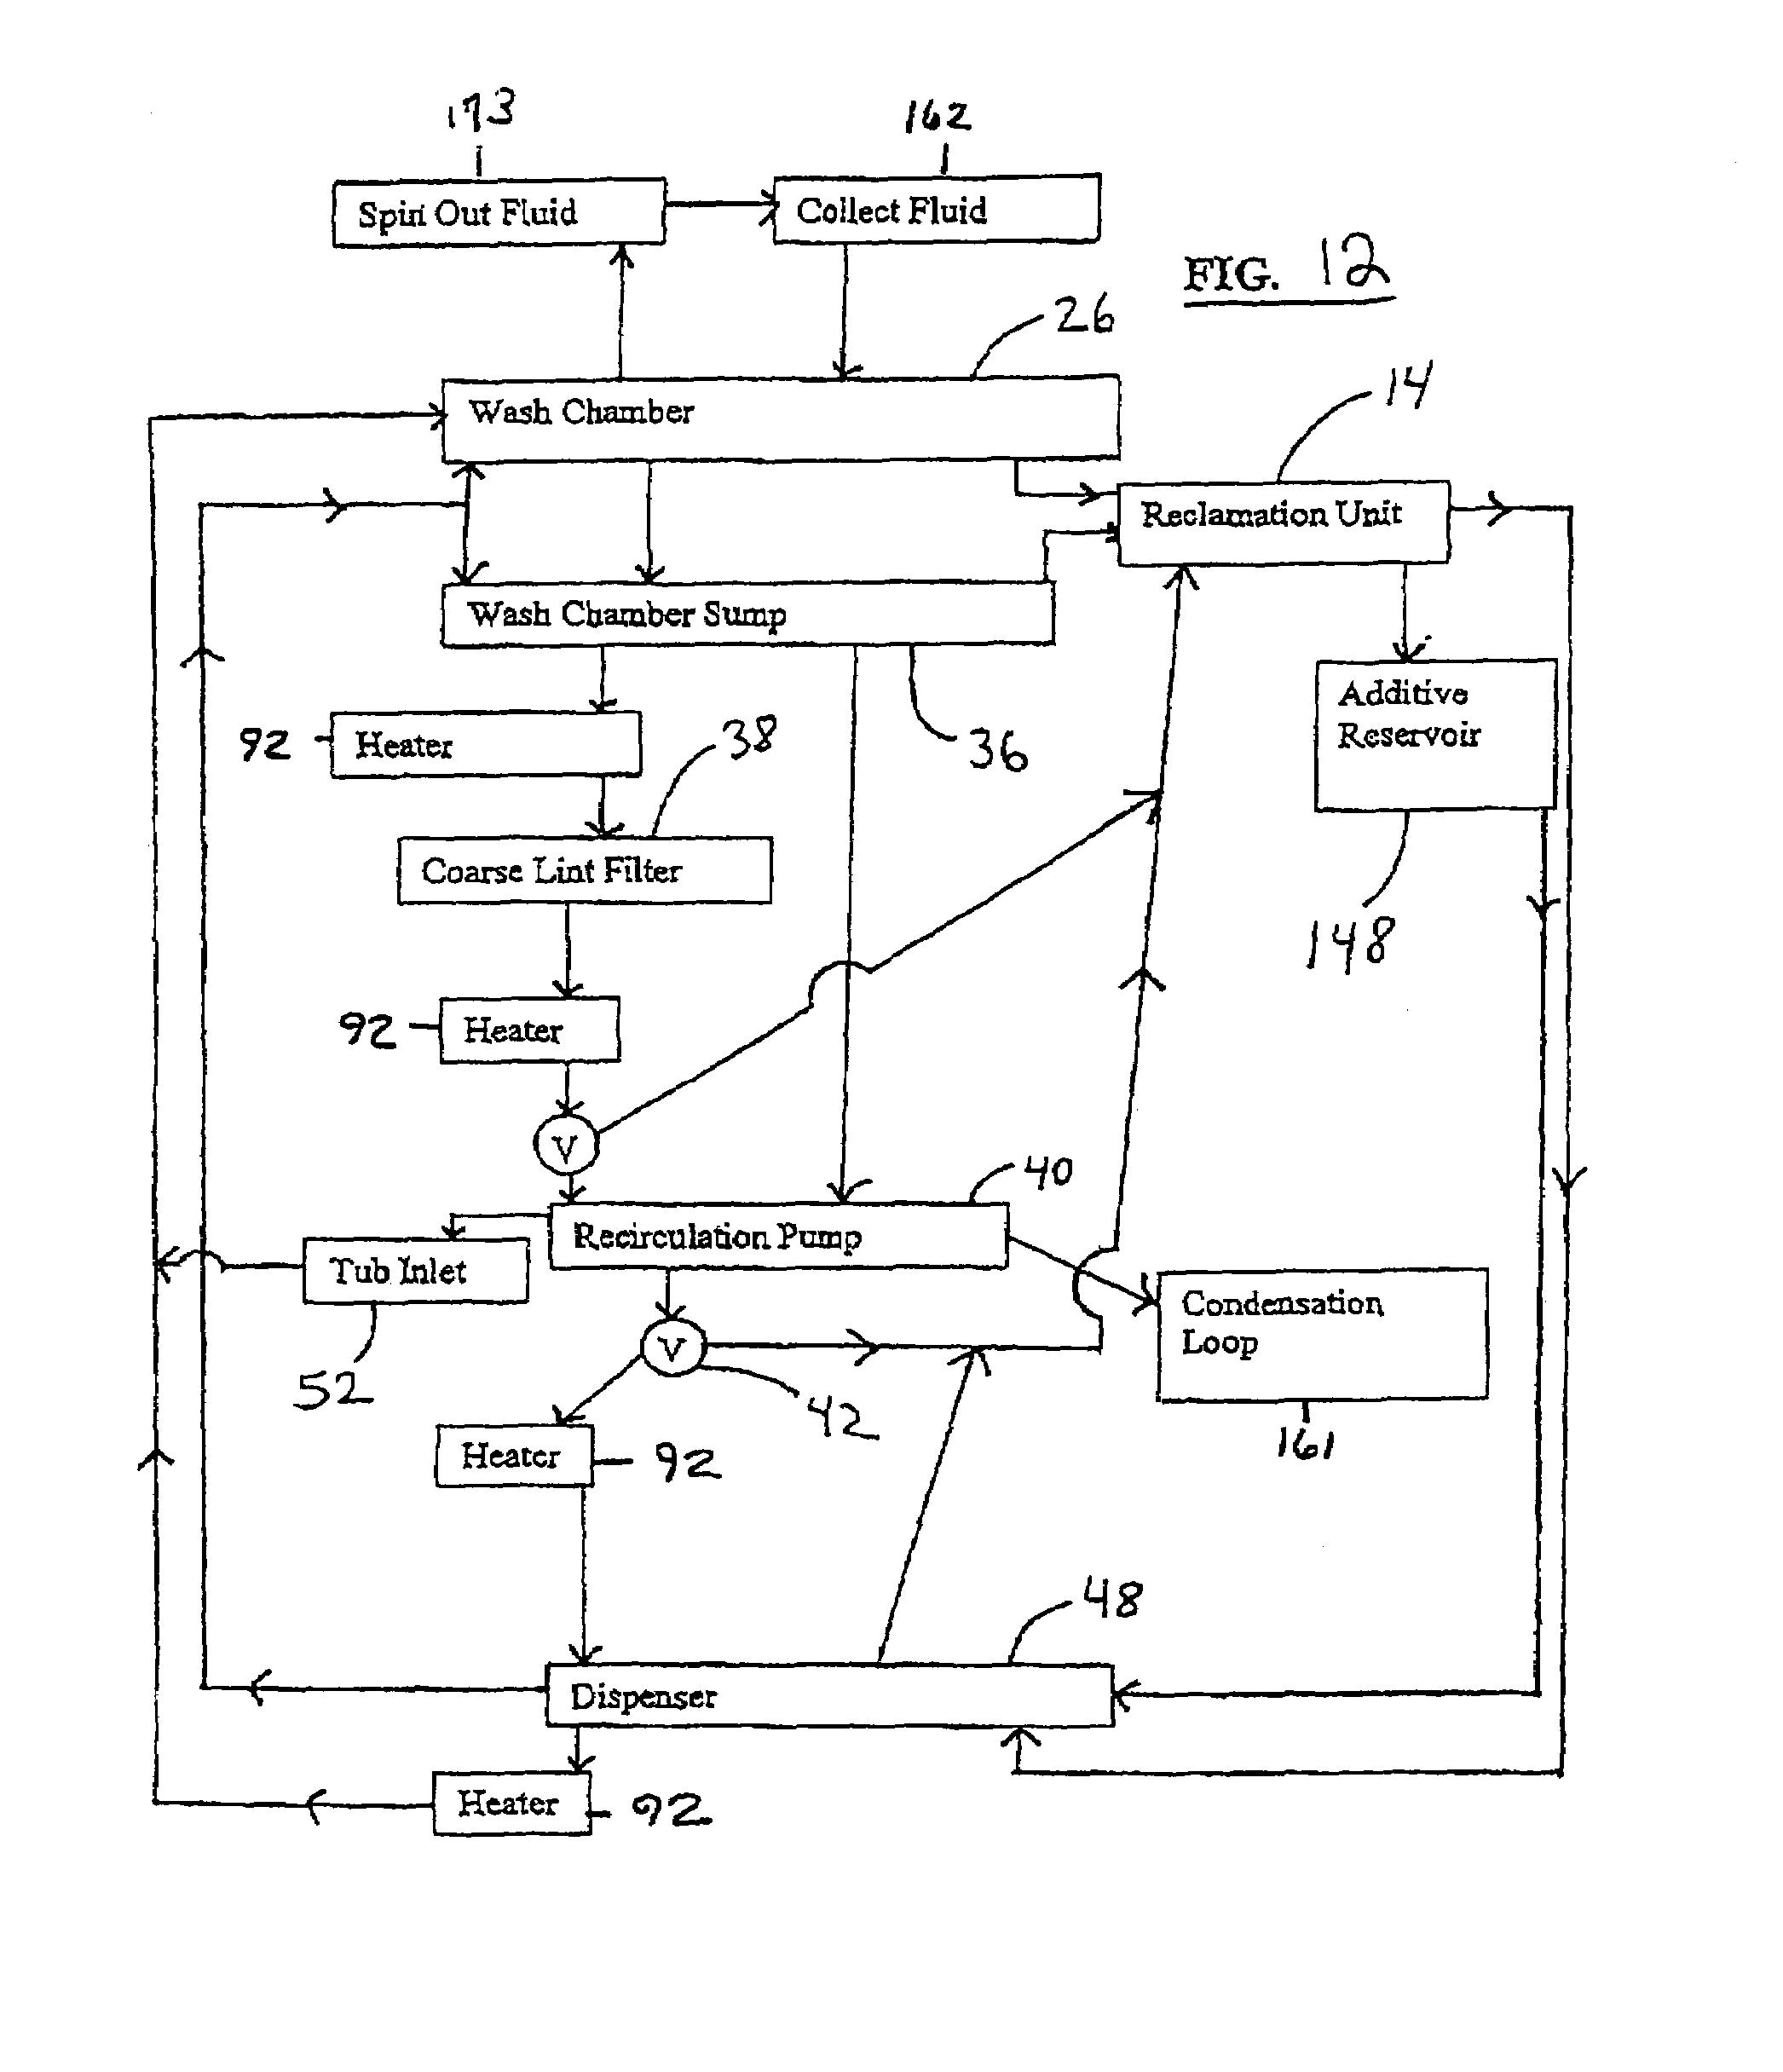 Similiar mini chopper wiring diagram for electric start with keywords wiring diagram